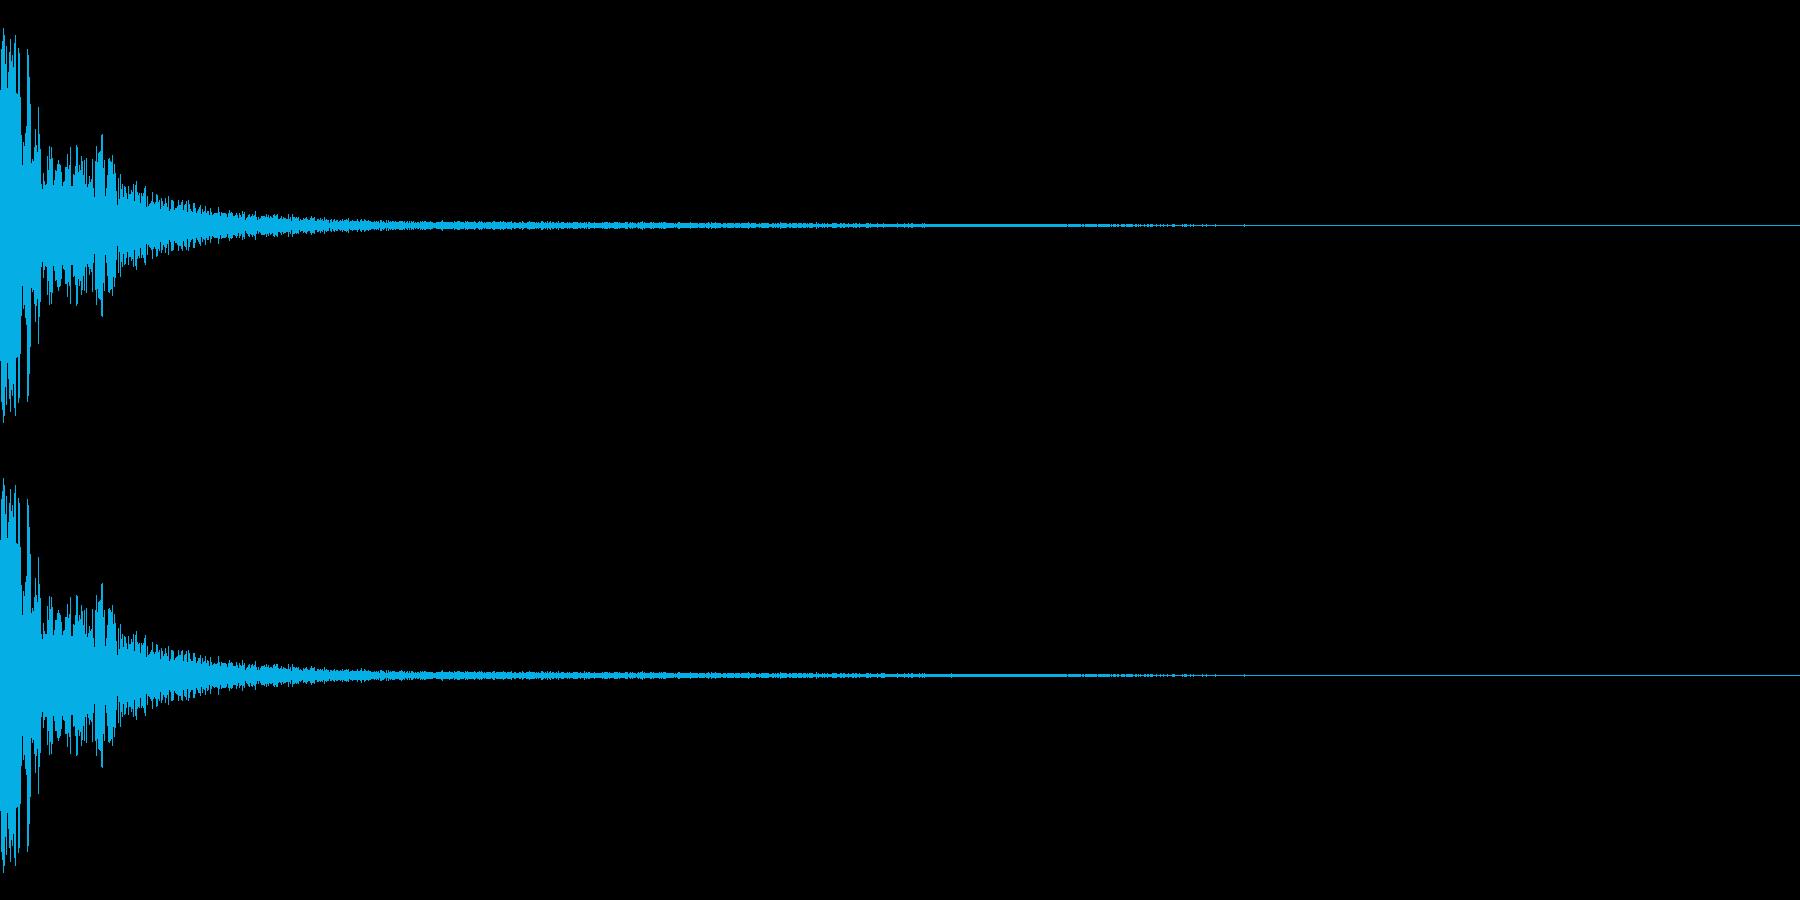 DTM Snare 3 オリジナル音源の再生済みの波形